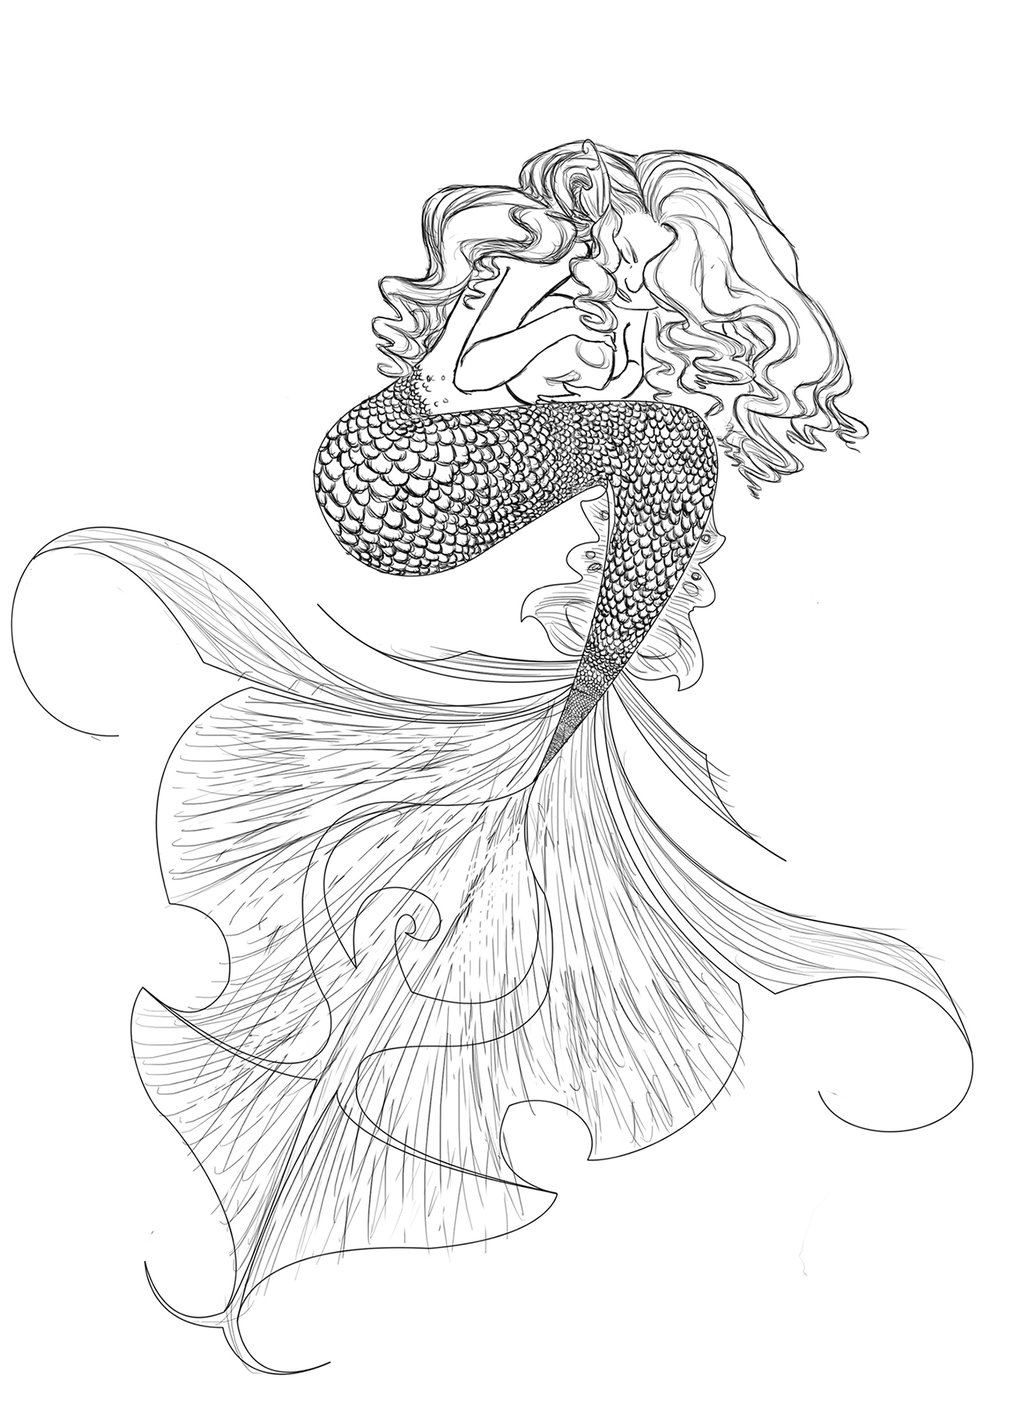 1024x1426 Mermaid Line Drawing By Jocegurr